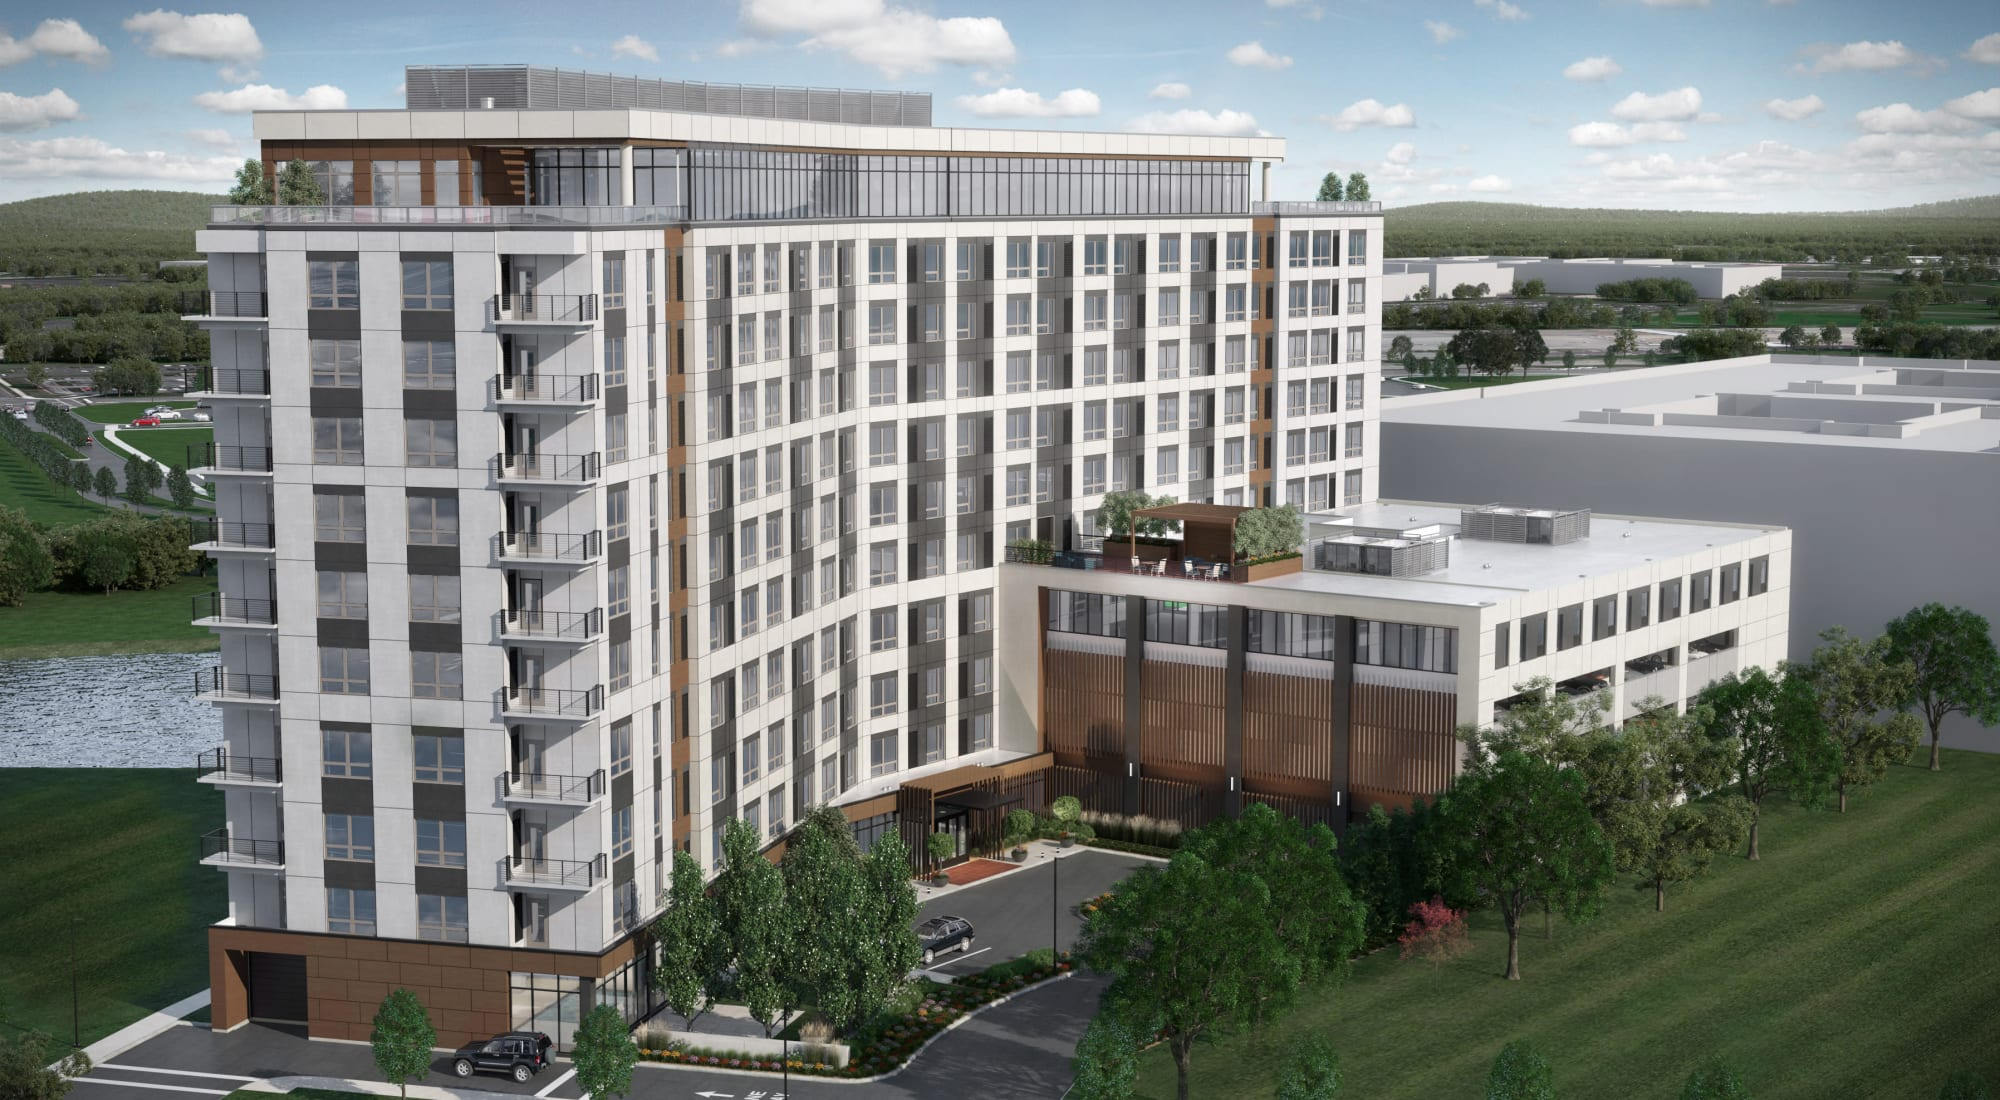 As Pandemic Changes Real Estate Landscape, Anthology Senior Living Optimistic About KofP Location